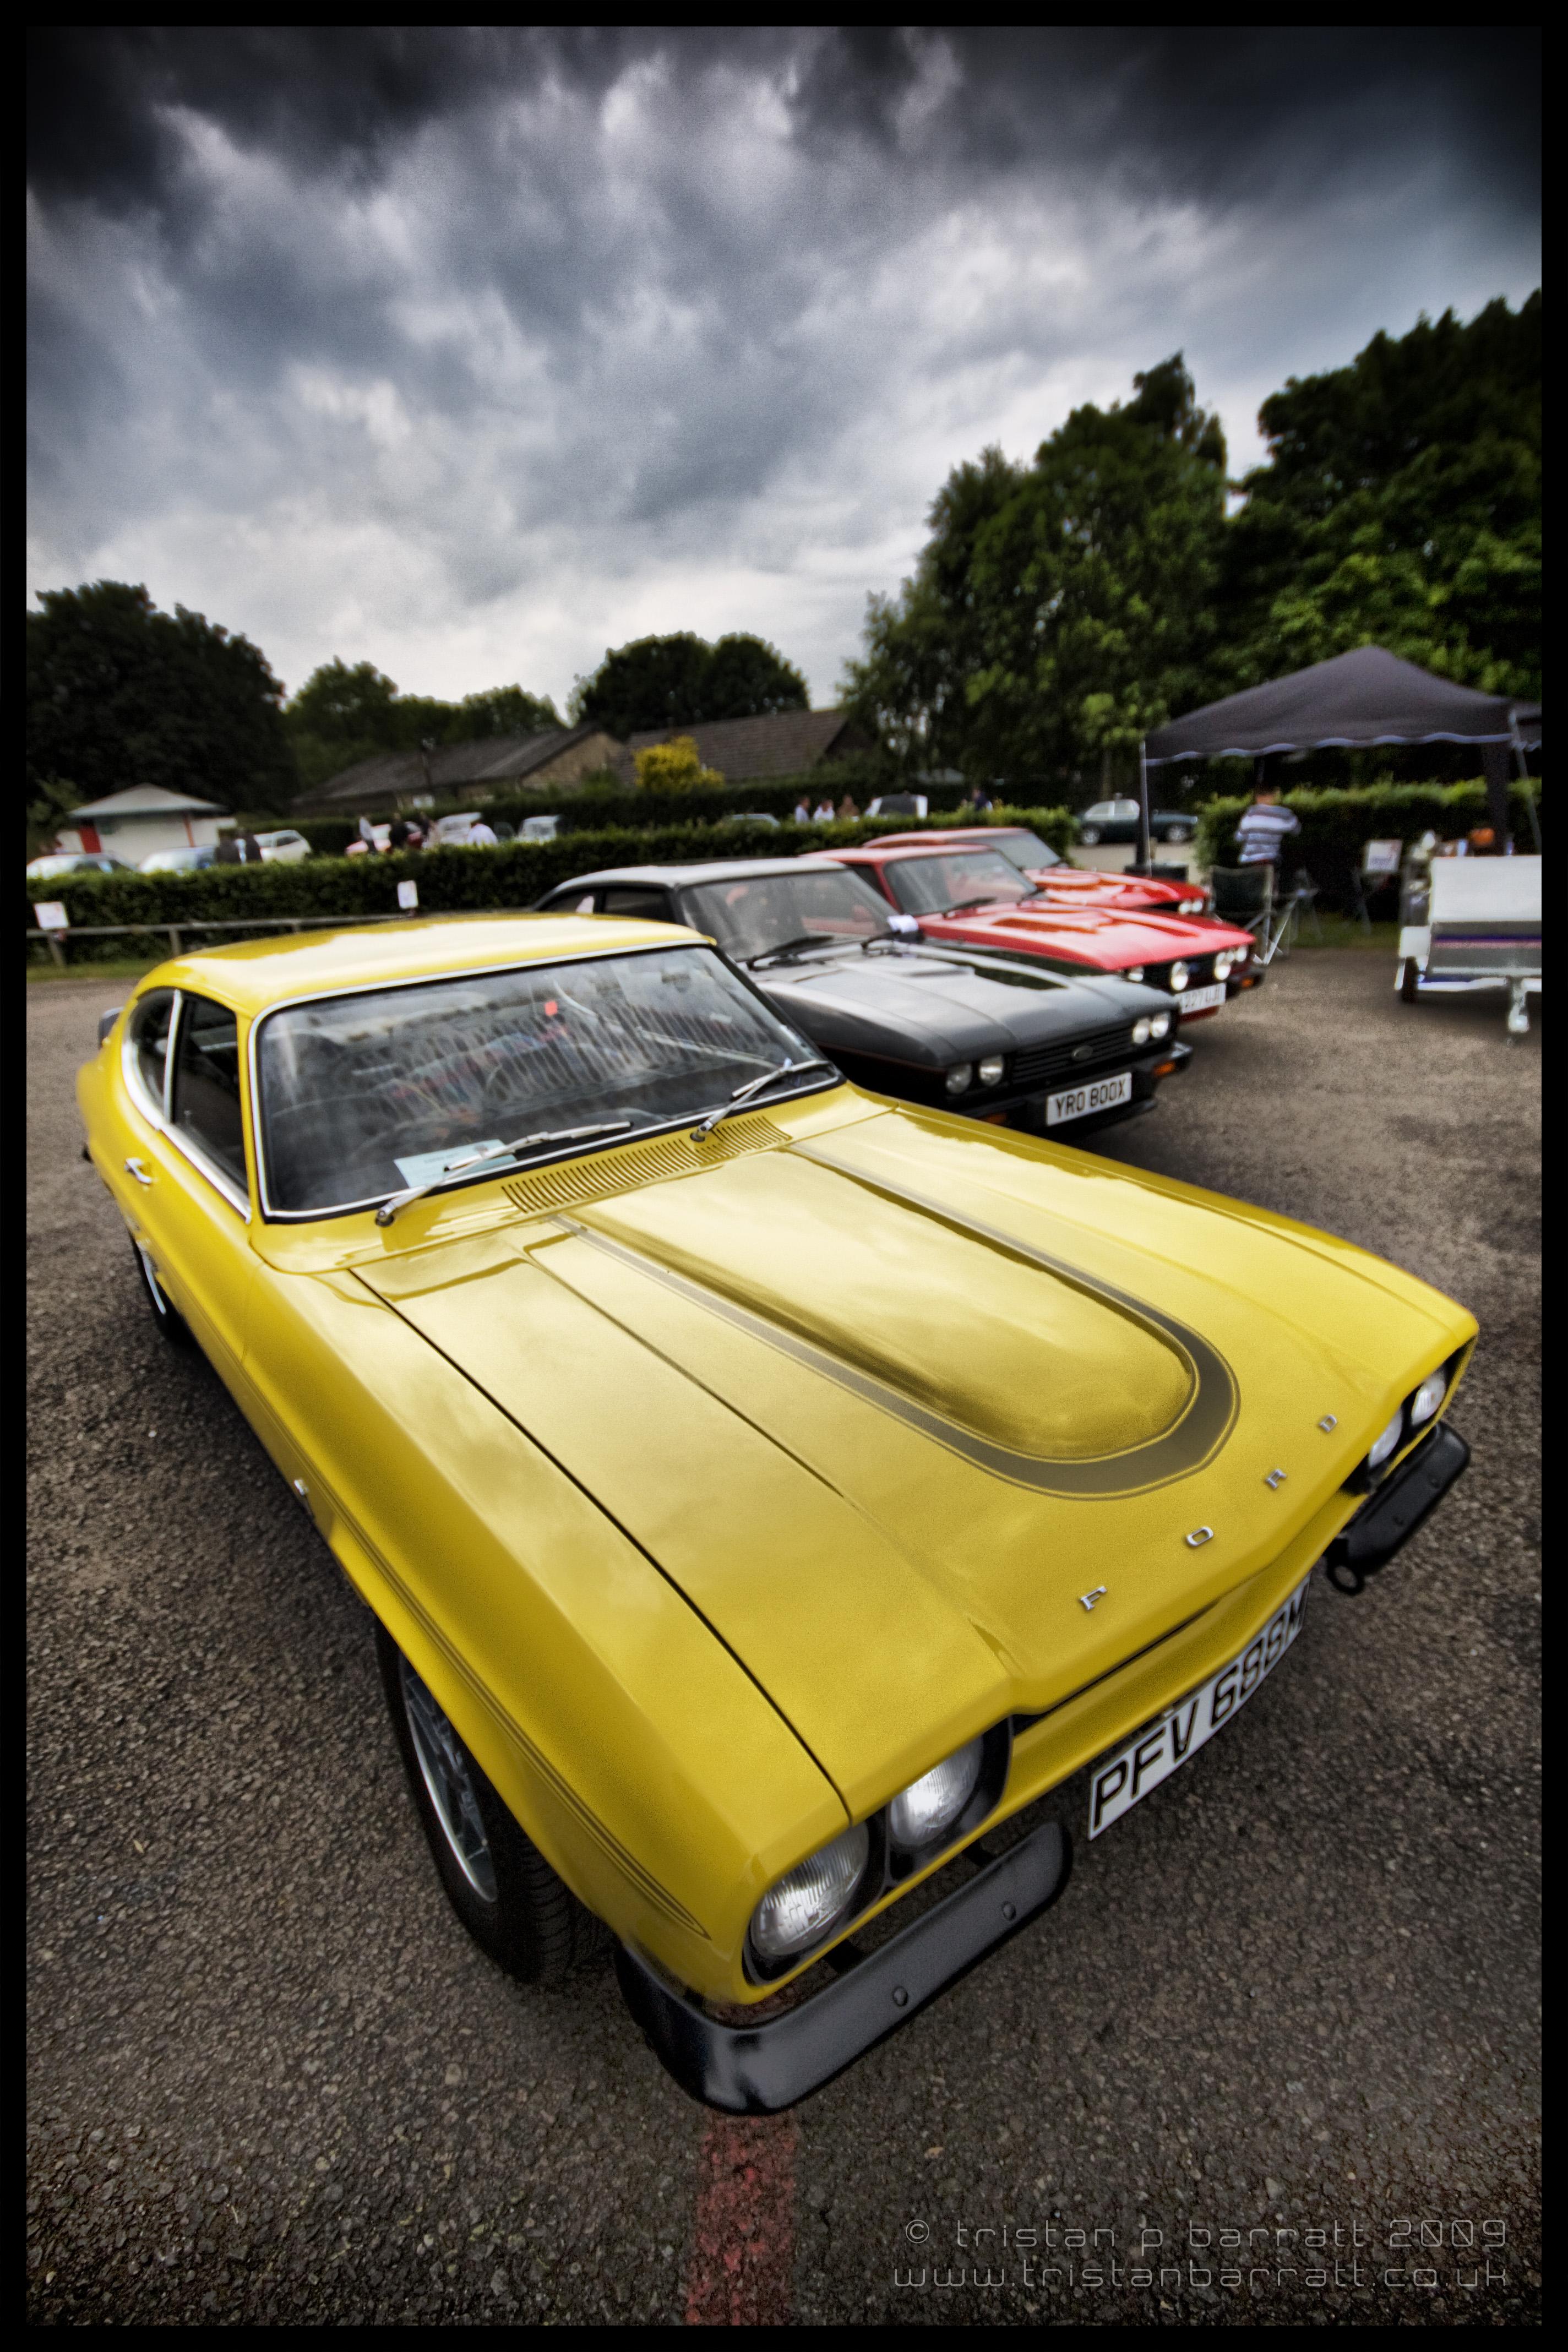 Re: Ford Capri 1600 GT XLR mk1